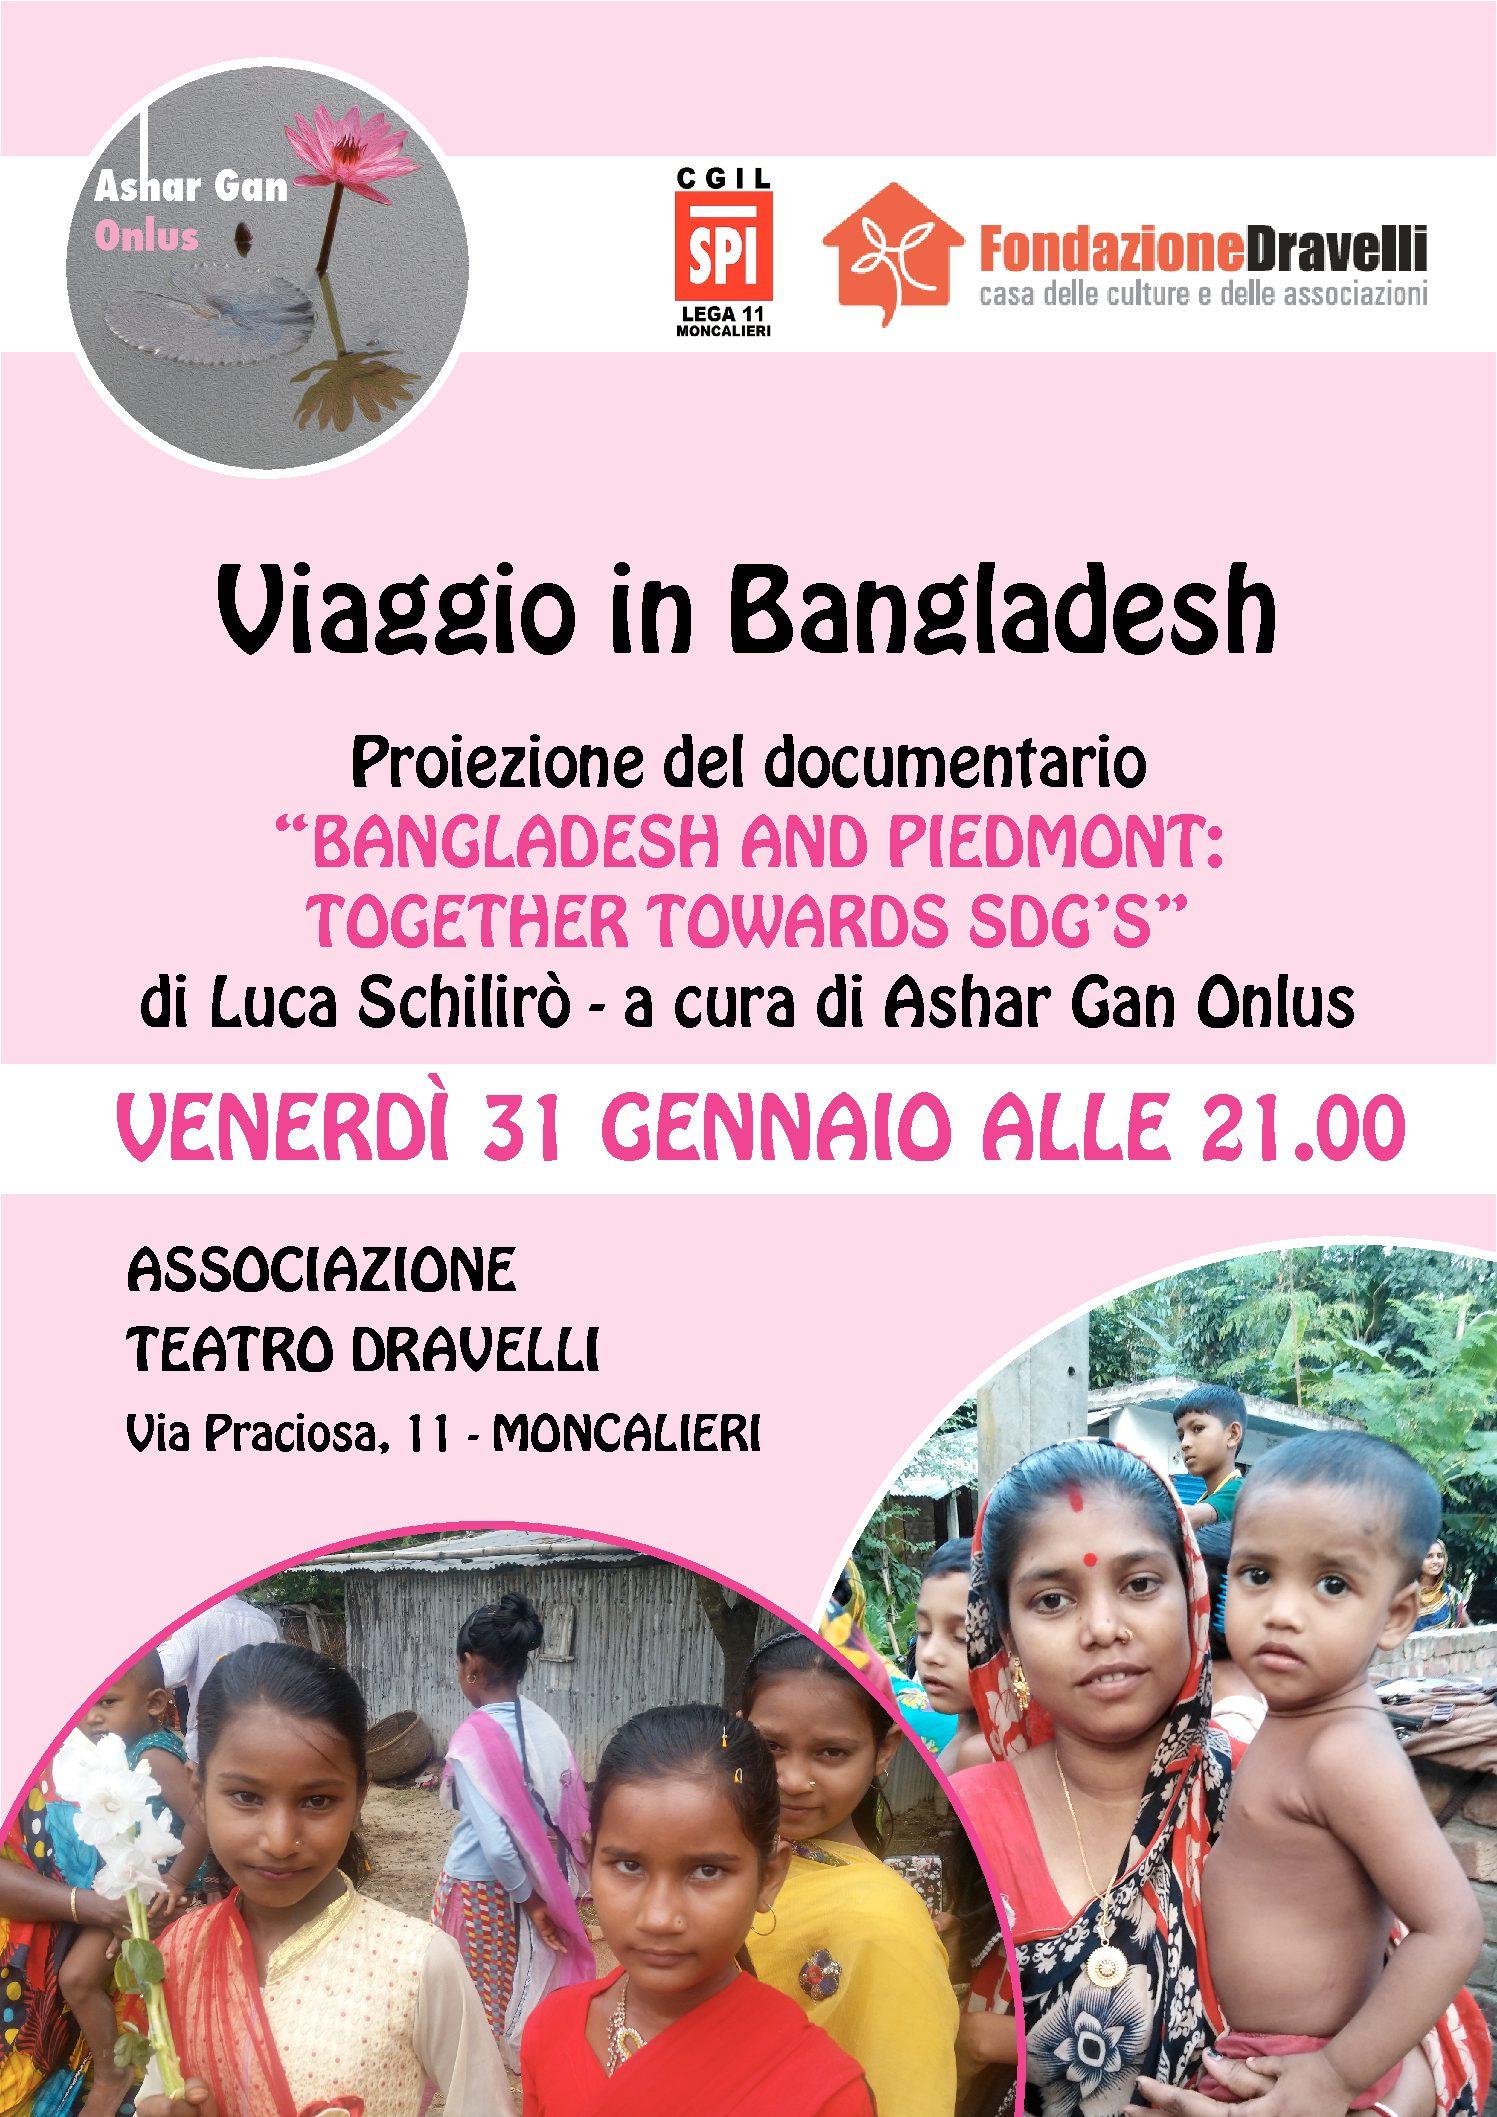 Viaggio in Bangladesh – 31/01/2020 Moncalieri